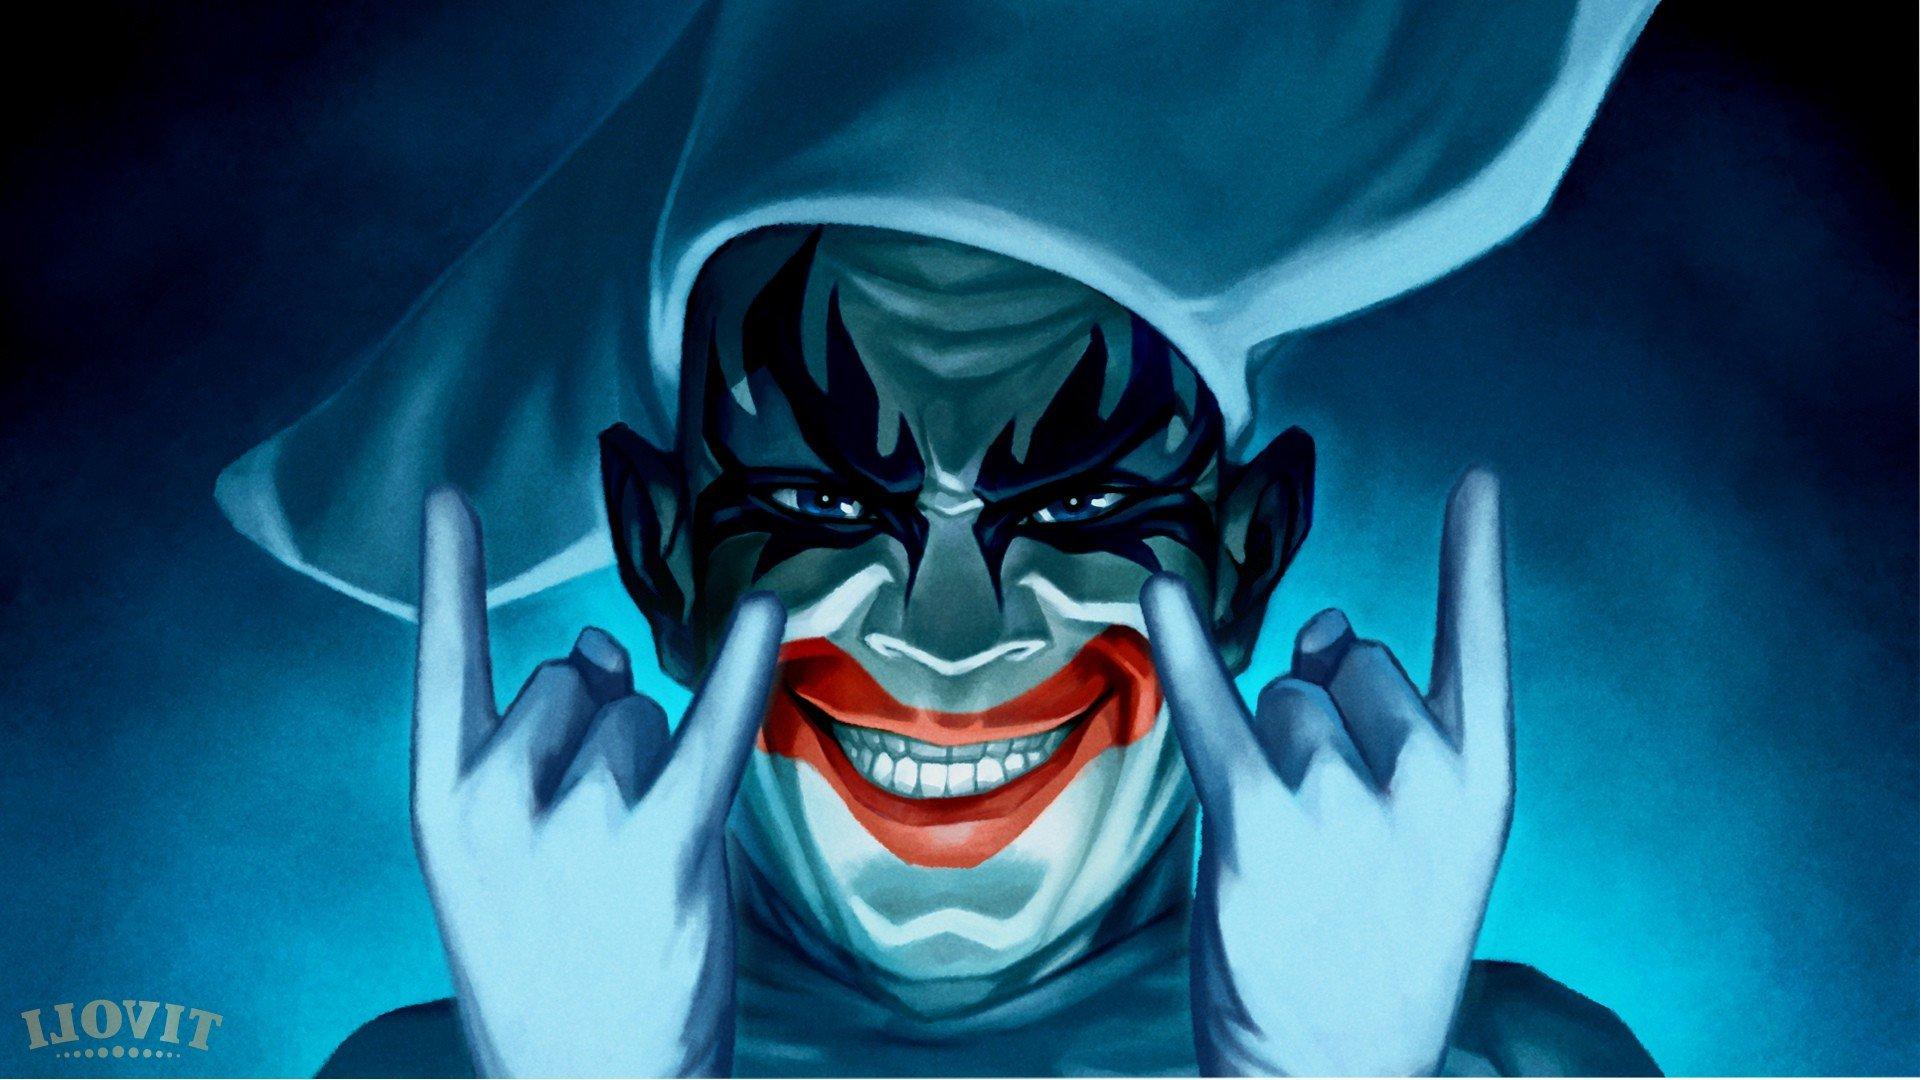 The Joker The Dark Knight K HD Desktop Wallpaper For K Ultra